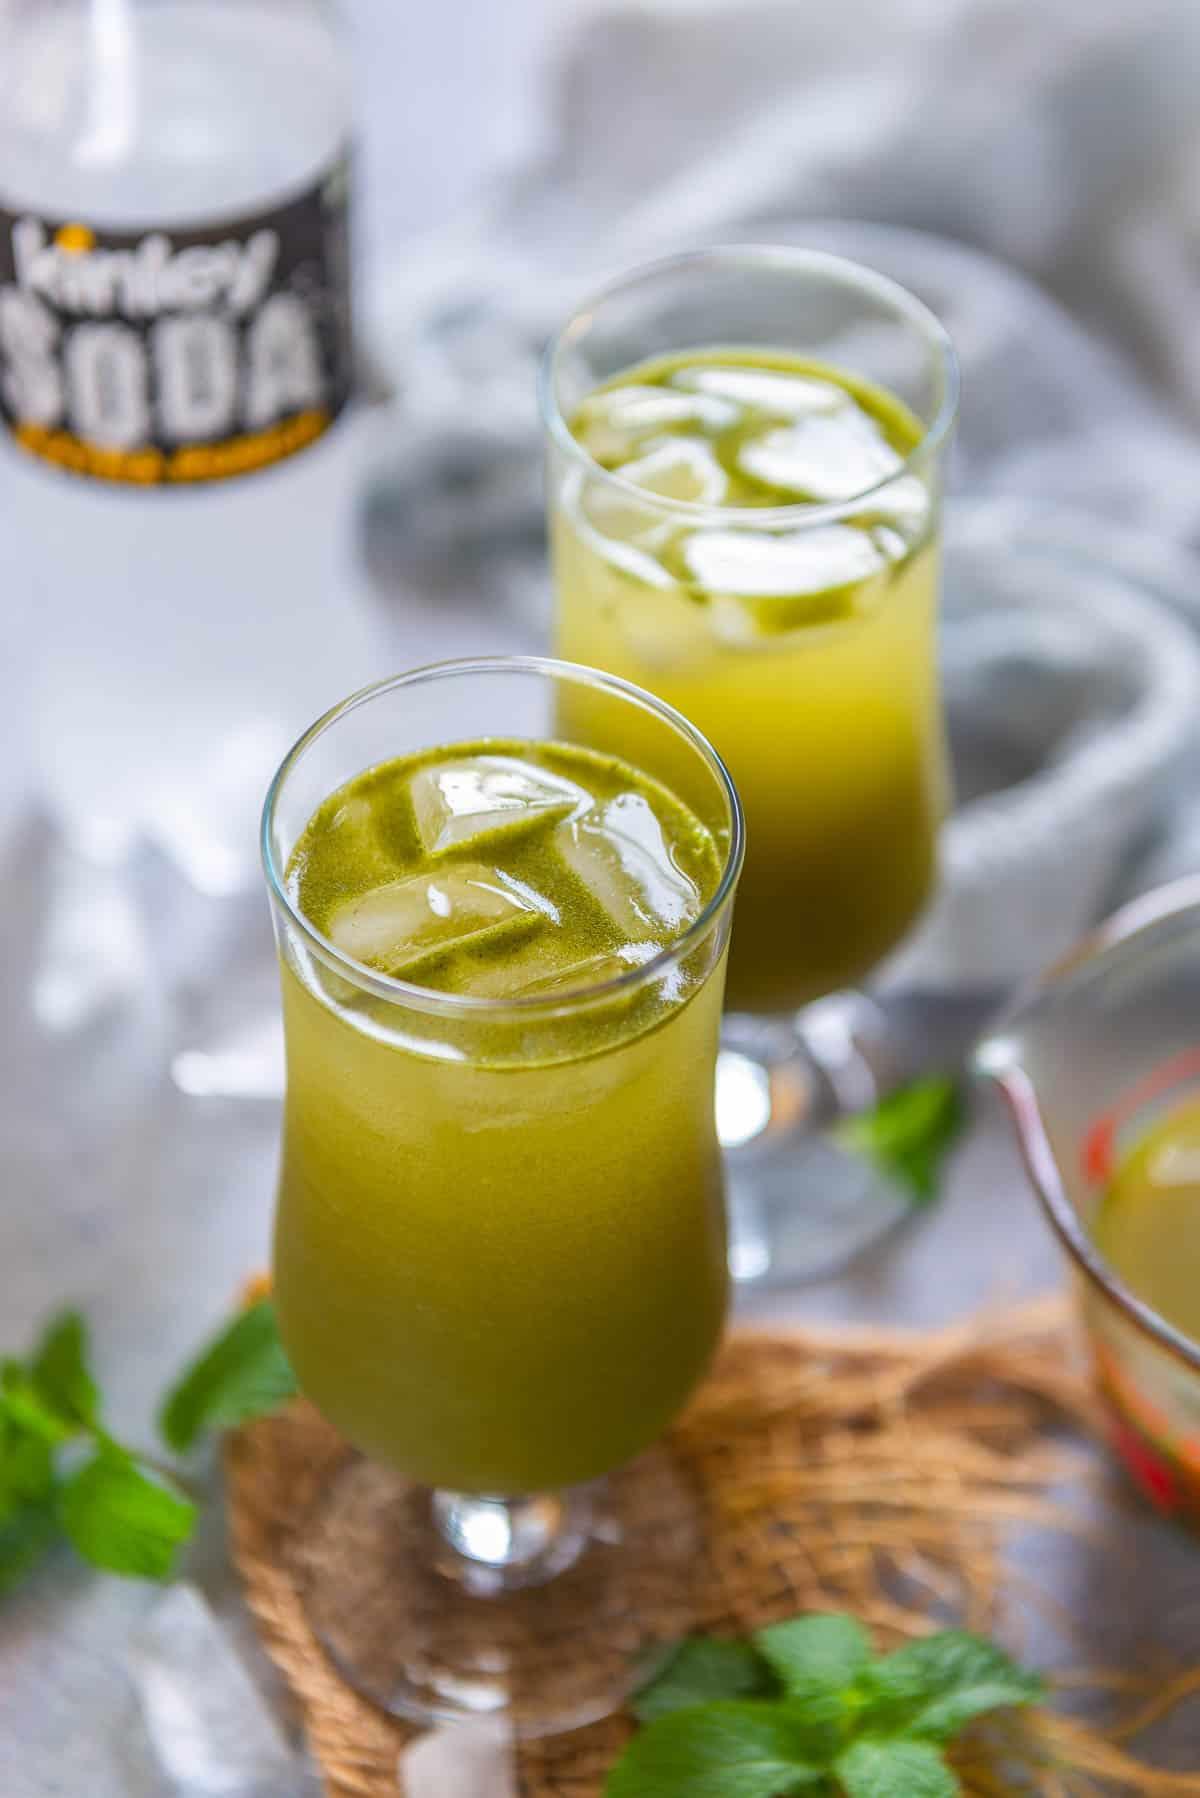 Masala soda served in a glass.